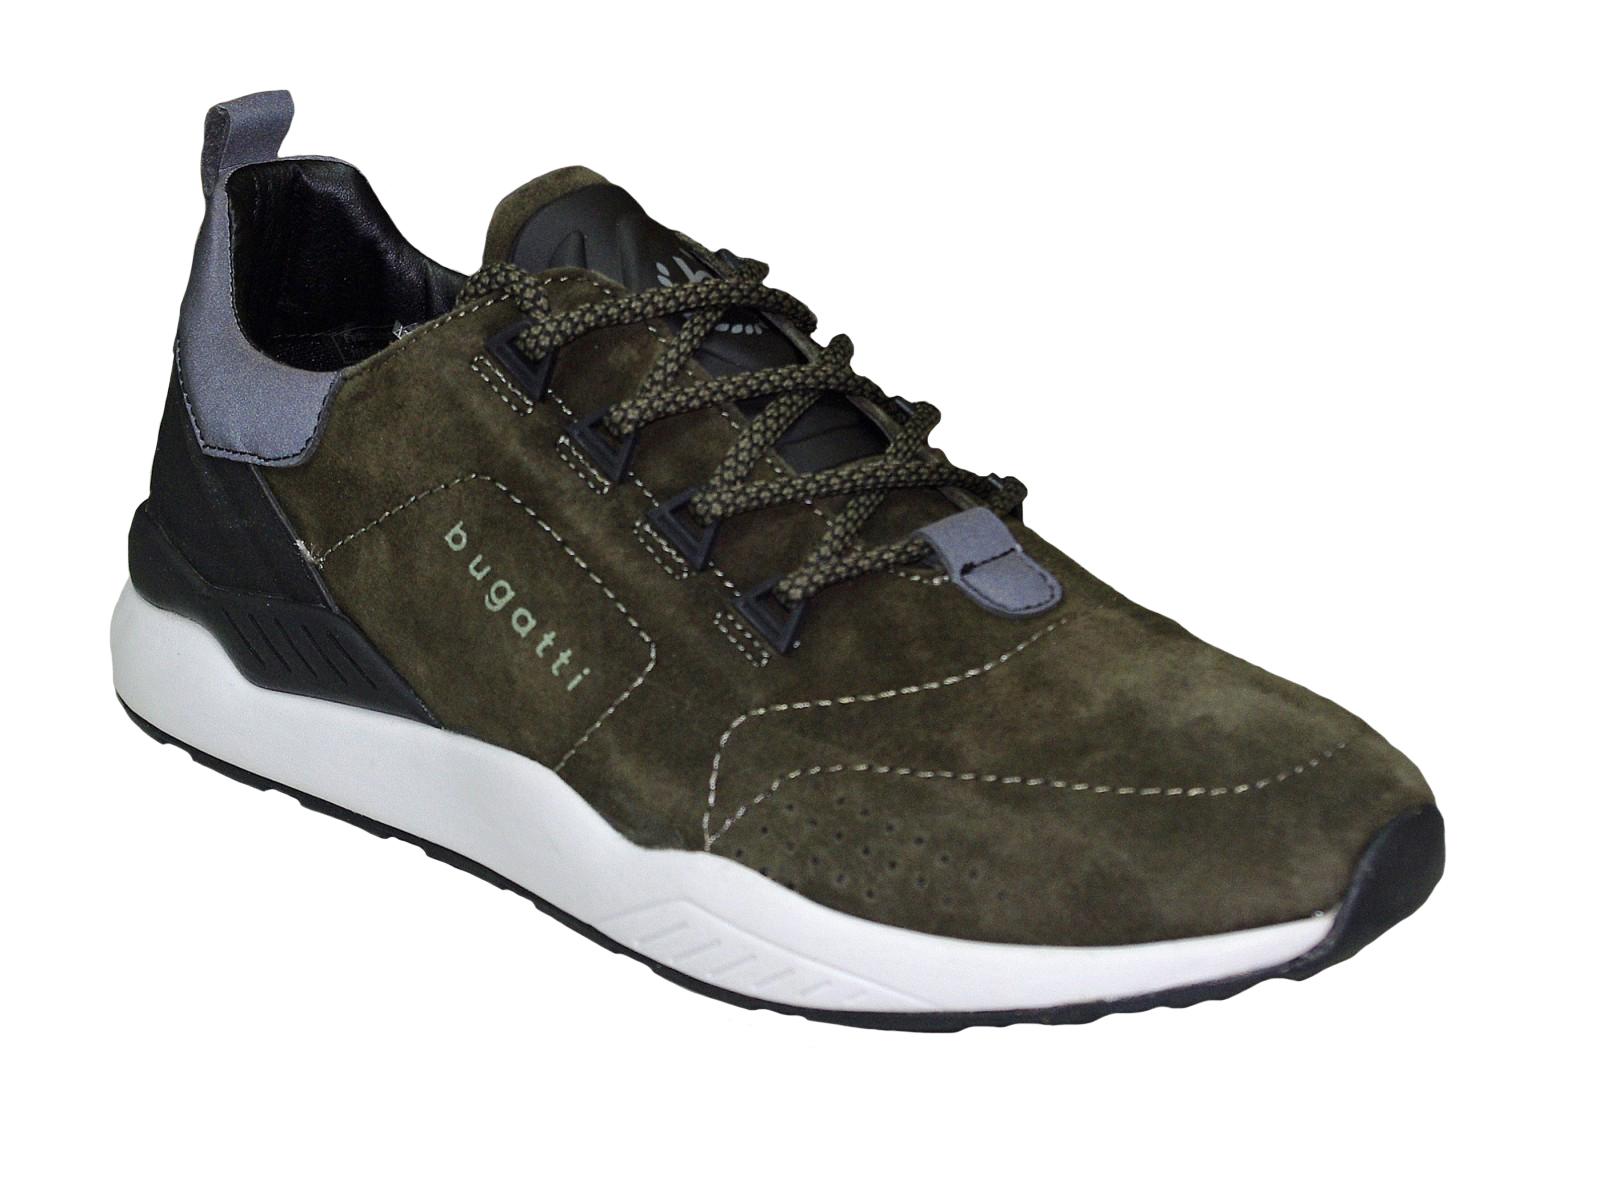 bugatti Herren Sneaker DY0308-5-700 green Herrenschuhe Sneaker 69e67ffeab